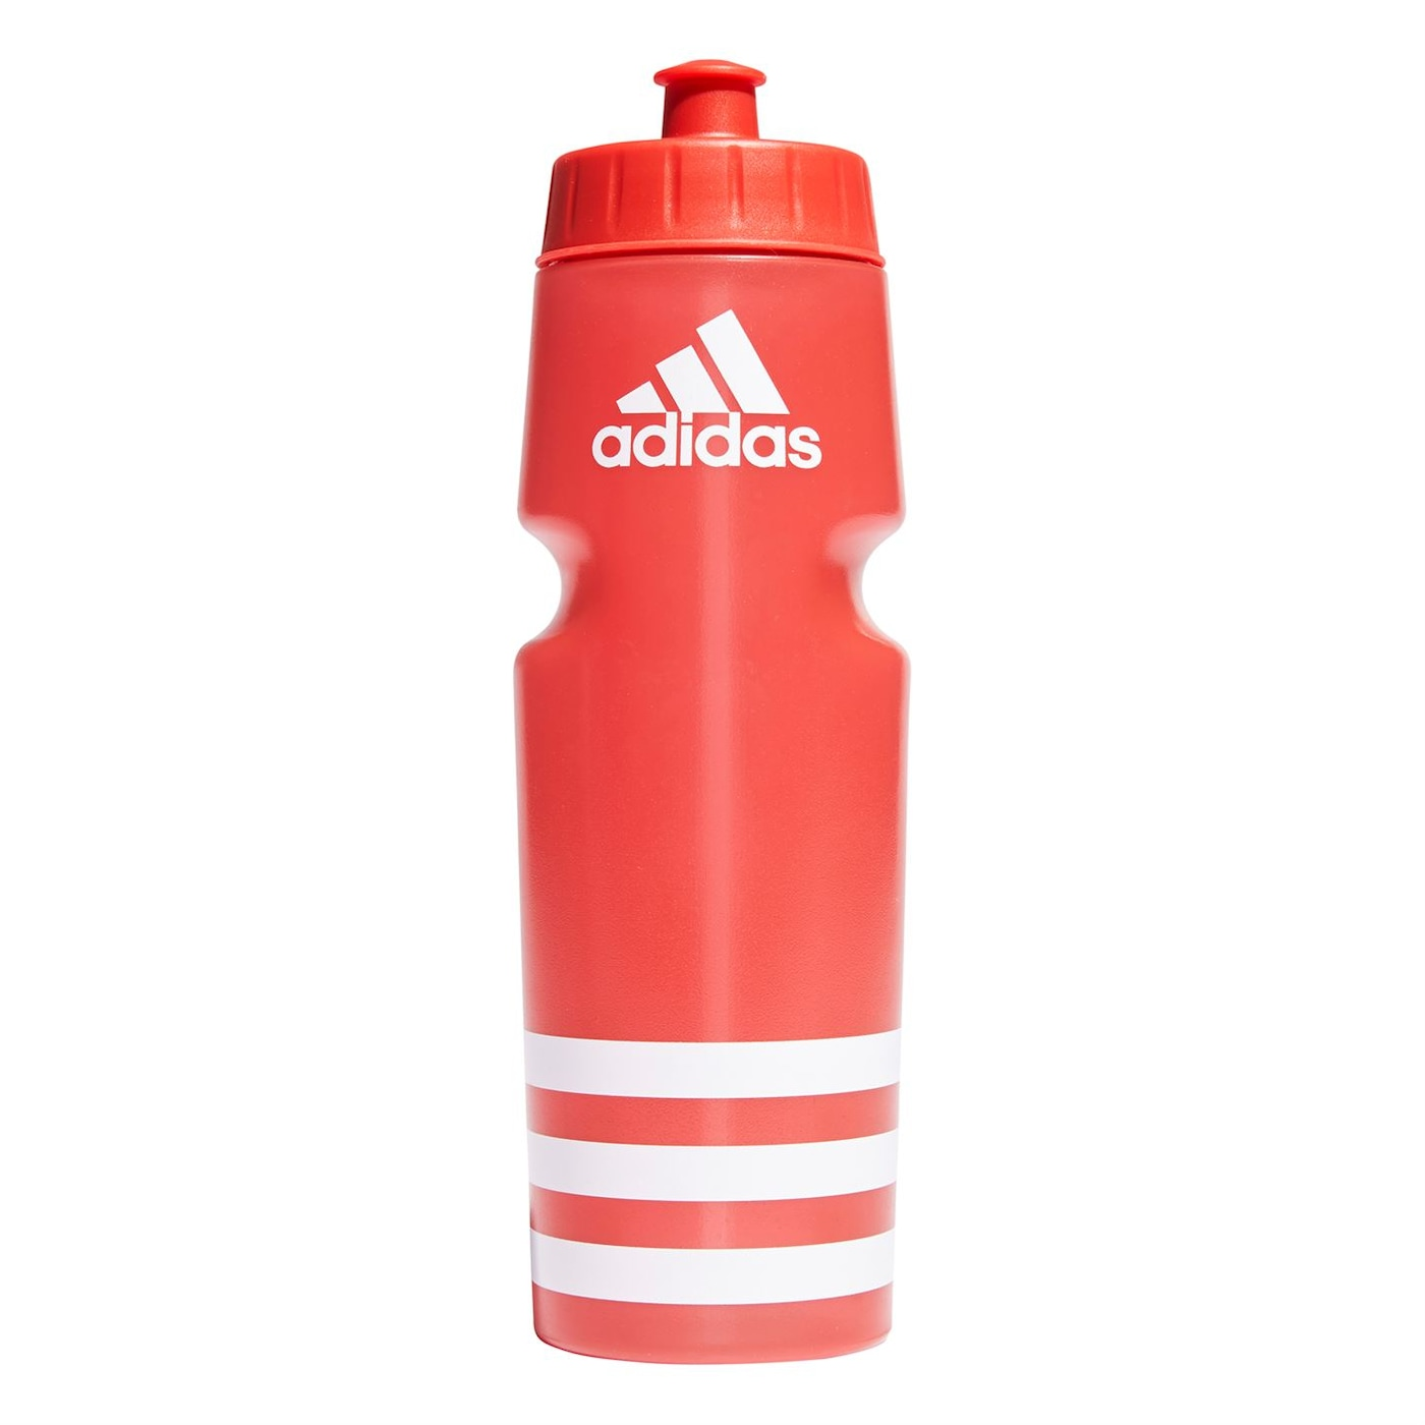 Adidas Perf Water Bottle 750ml